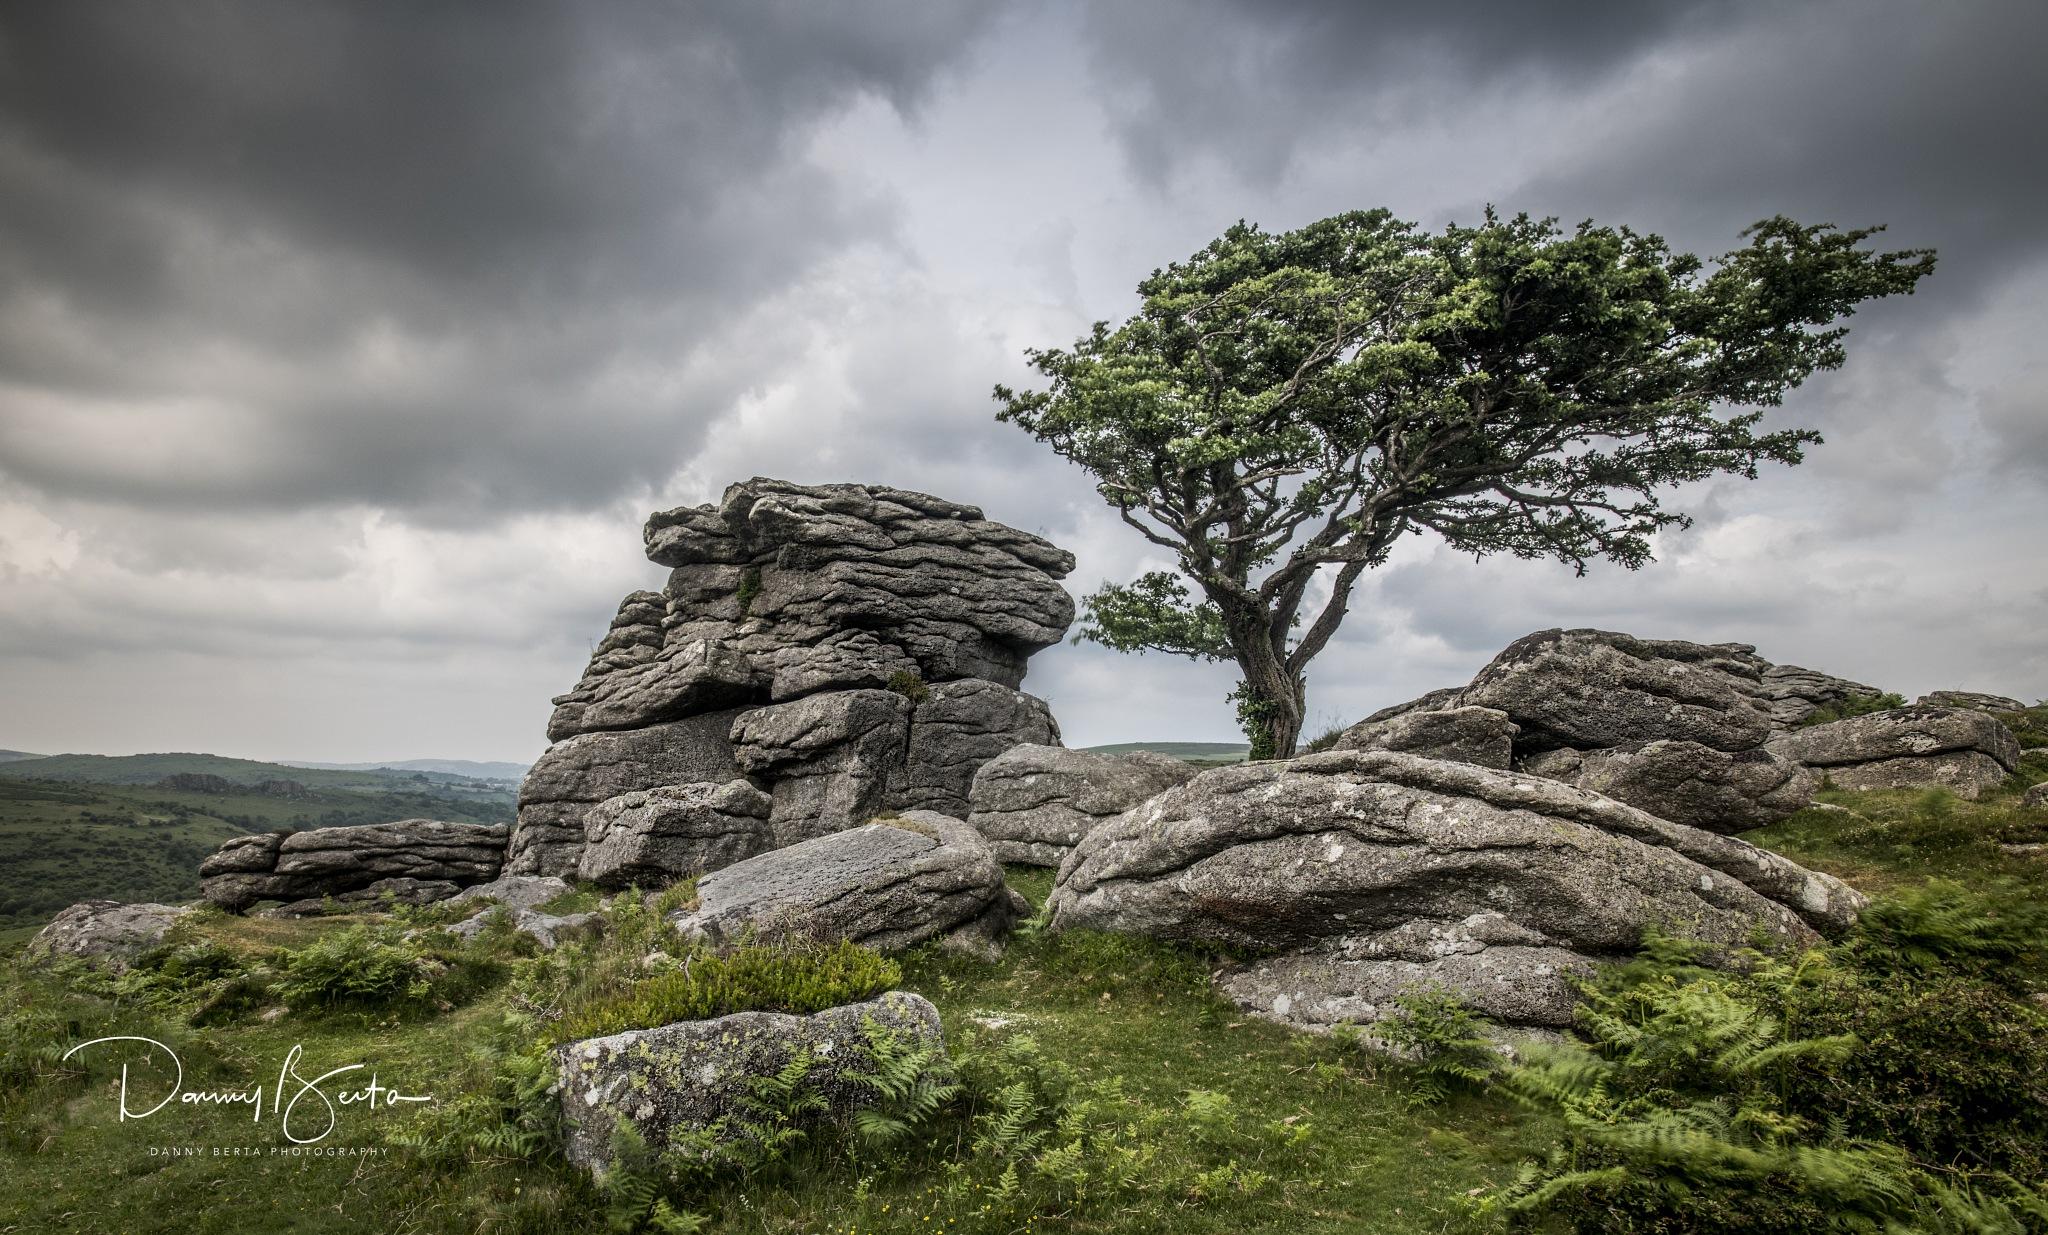 The Tree - Dartmoor by Danny Berta